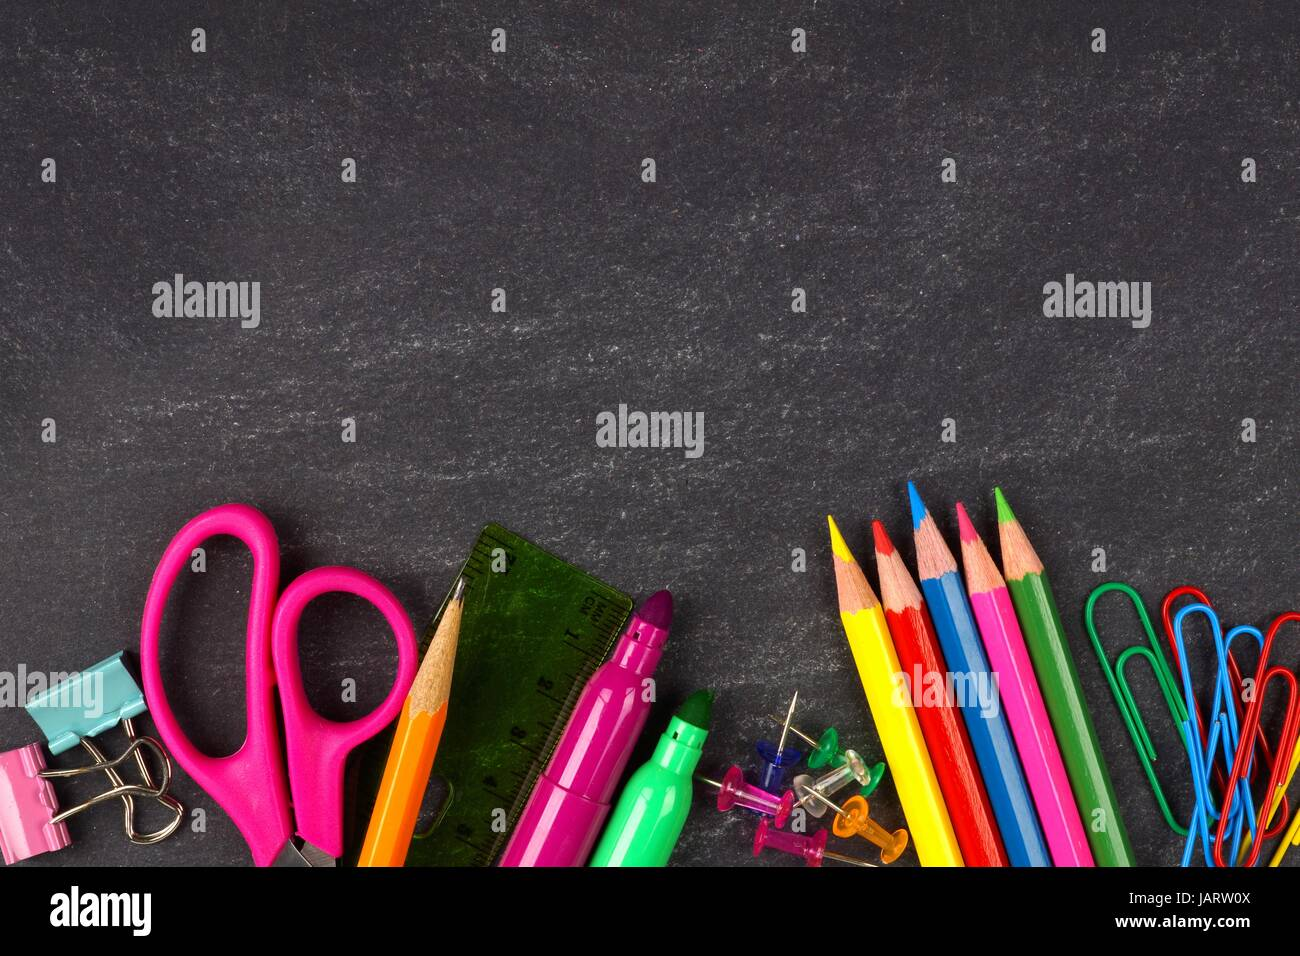 School Supplies Bottom Border On A Chalkboard Background